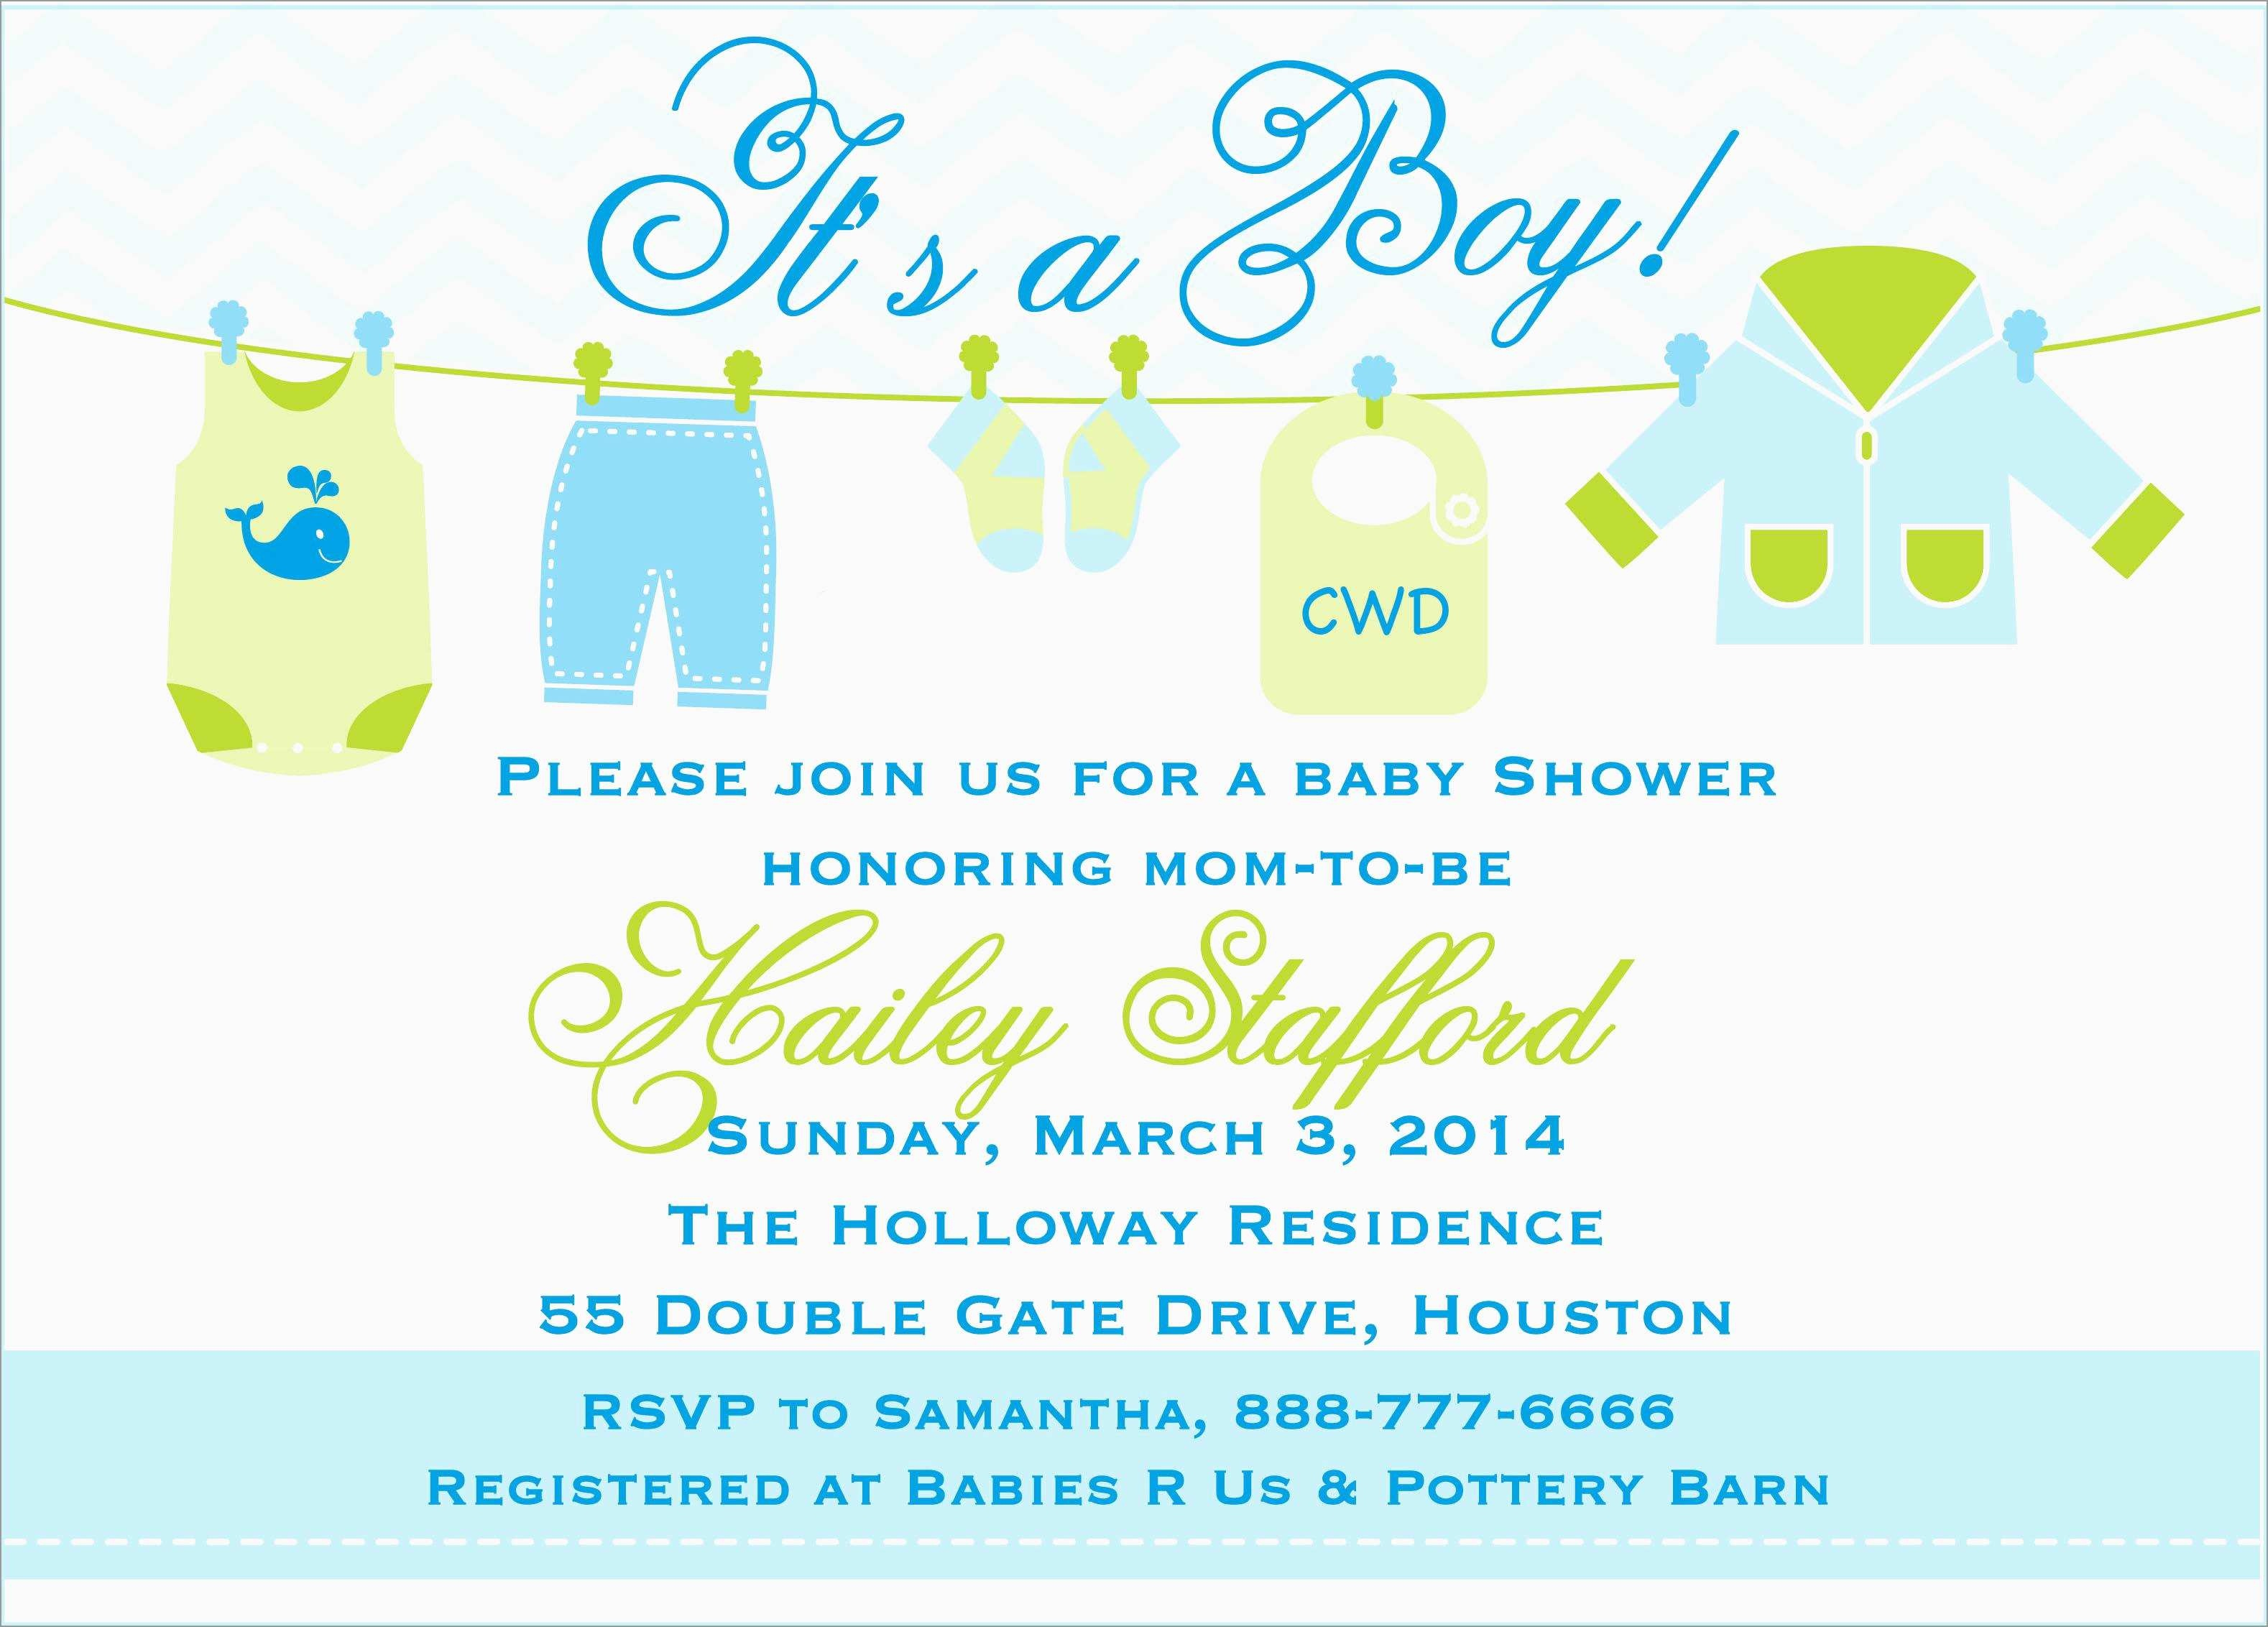 Elegant Free Printable Baby Shower Invitations Templates For Boys - Free Printable Baby Shower Invitations For Boys